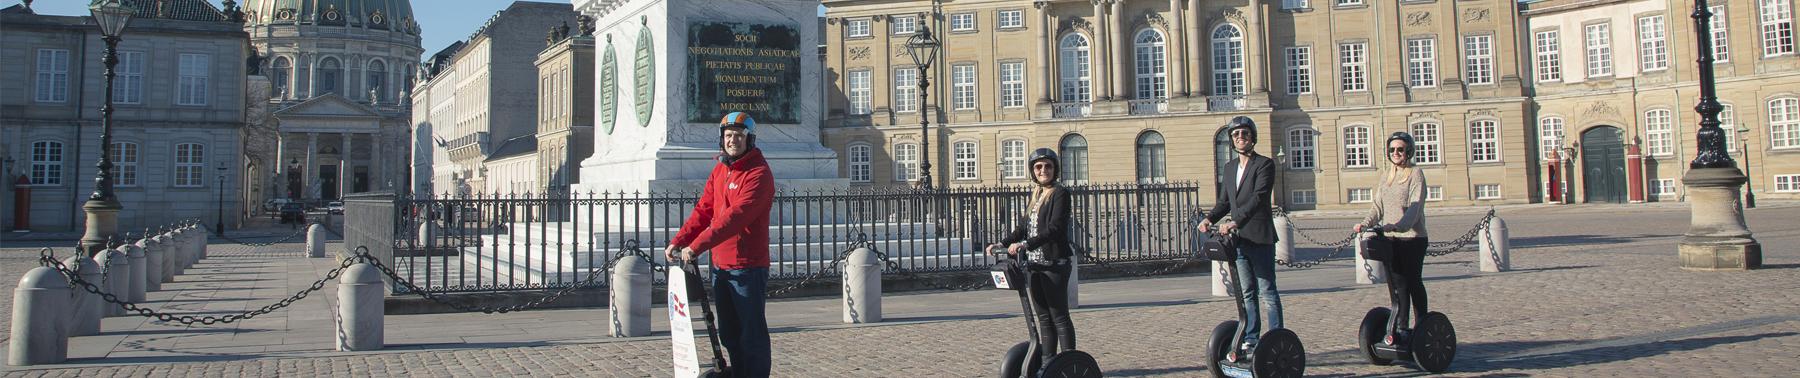 Segway Sightseeing Tours at The Royal Palace